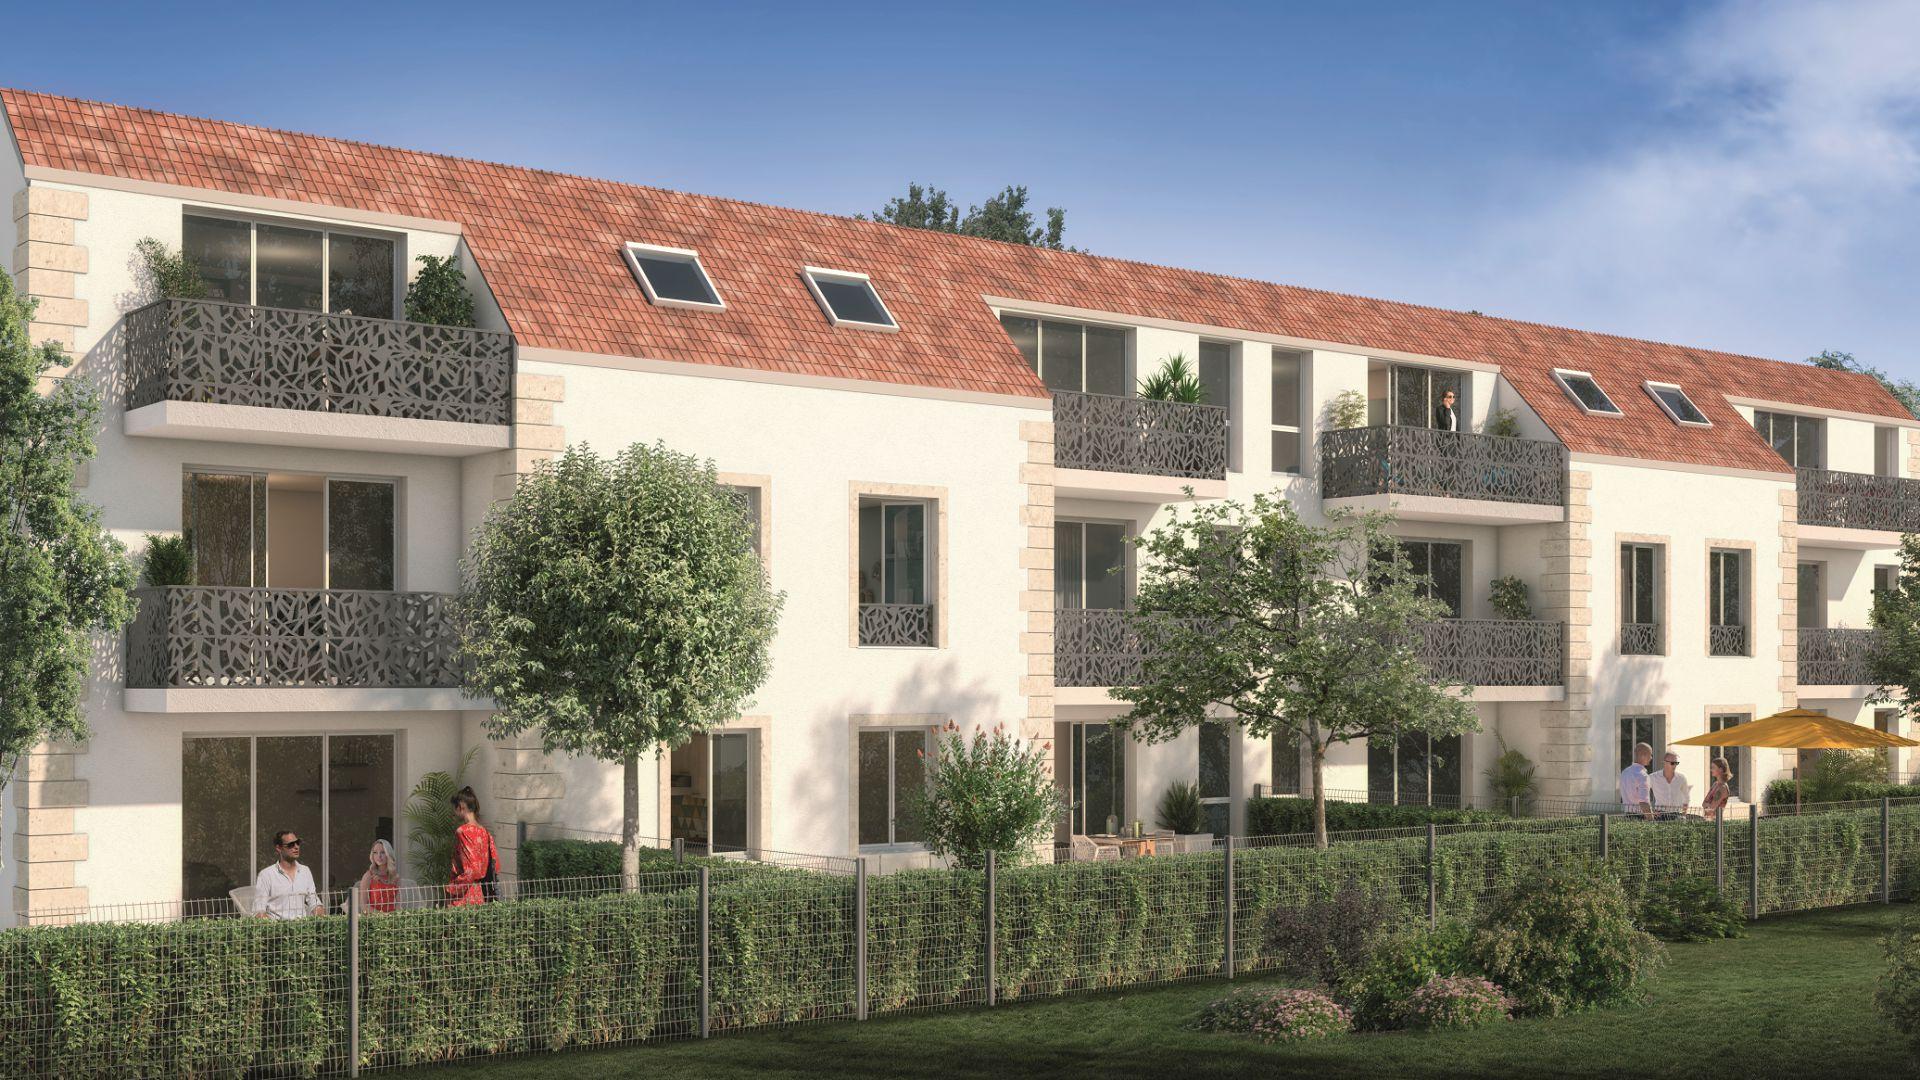 GreenCity immobilier - Vert-Le-Petit - 91710 - résidence Le Green Val - appartements neufs T2 - T3 - T4